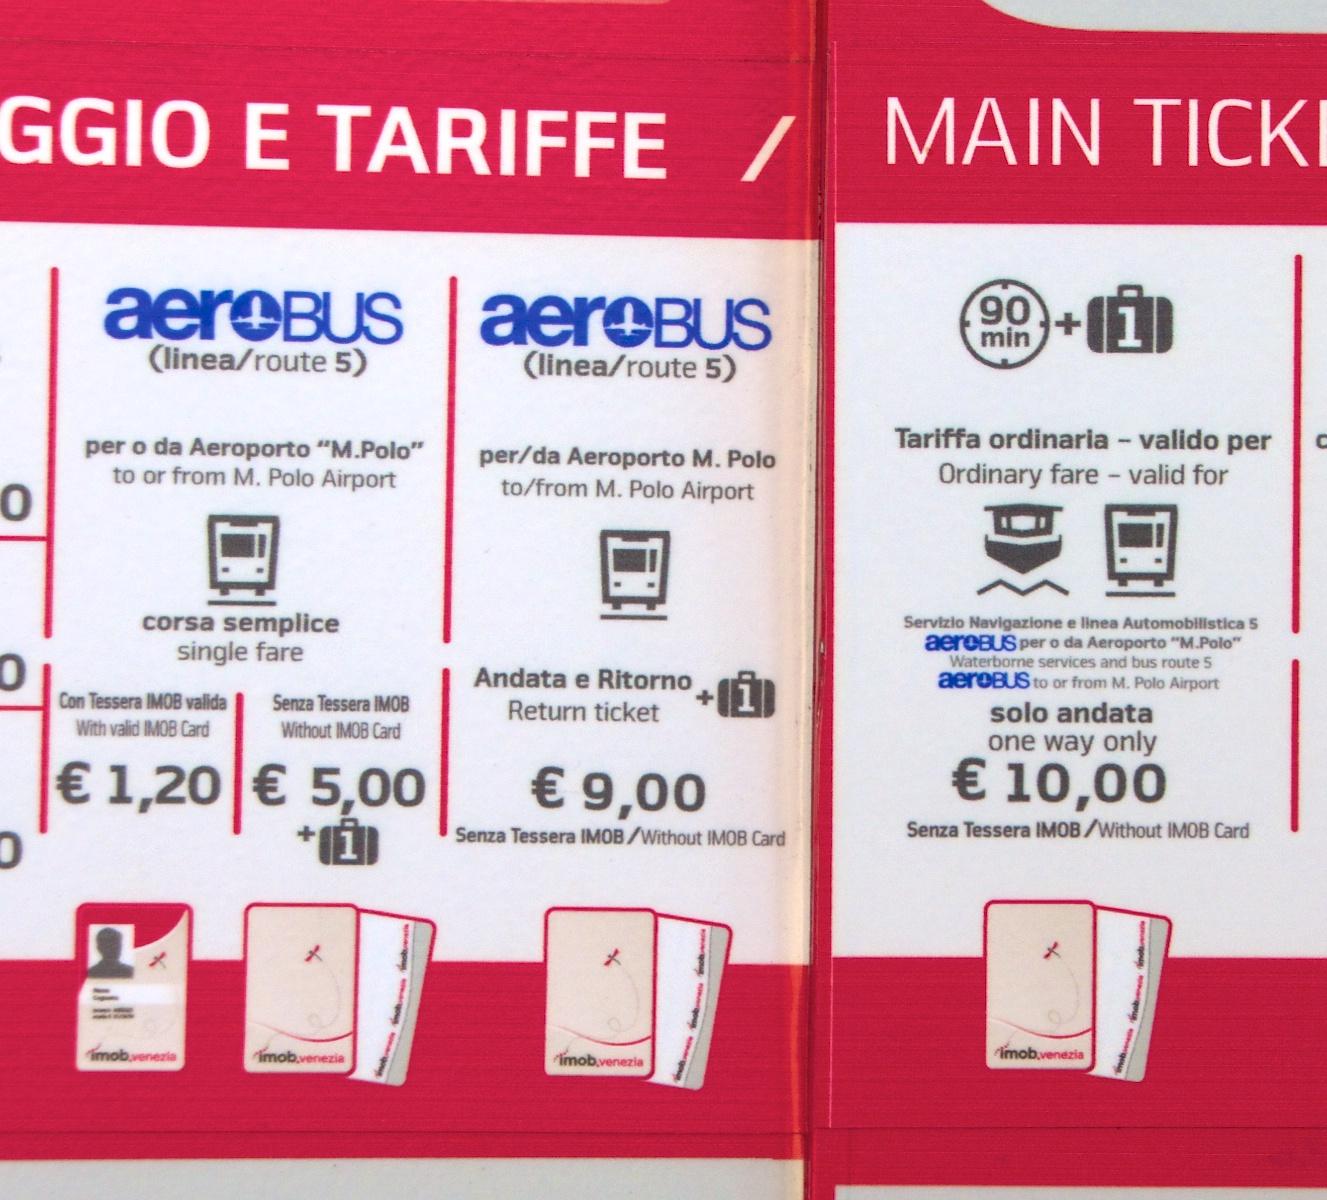 Venice Airport Aerobus Ticket prices